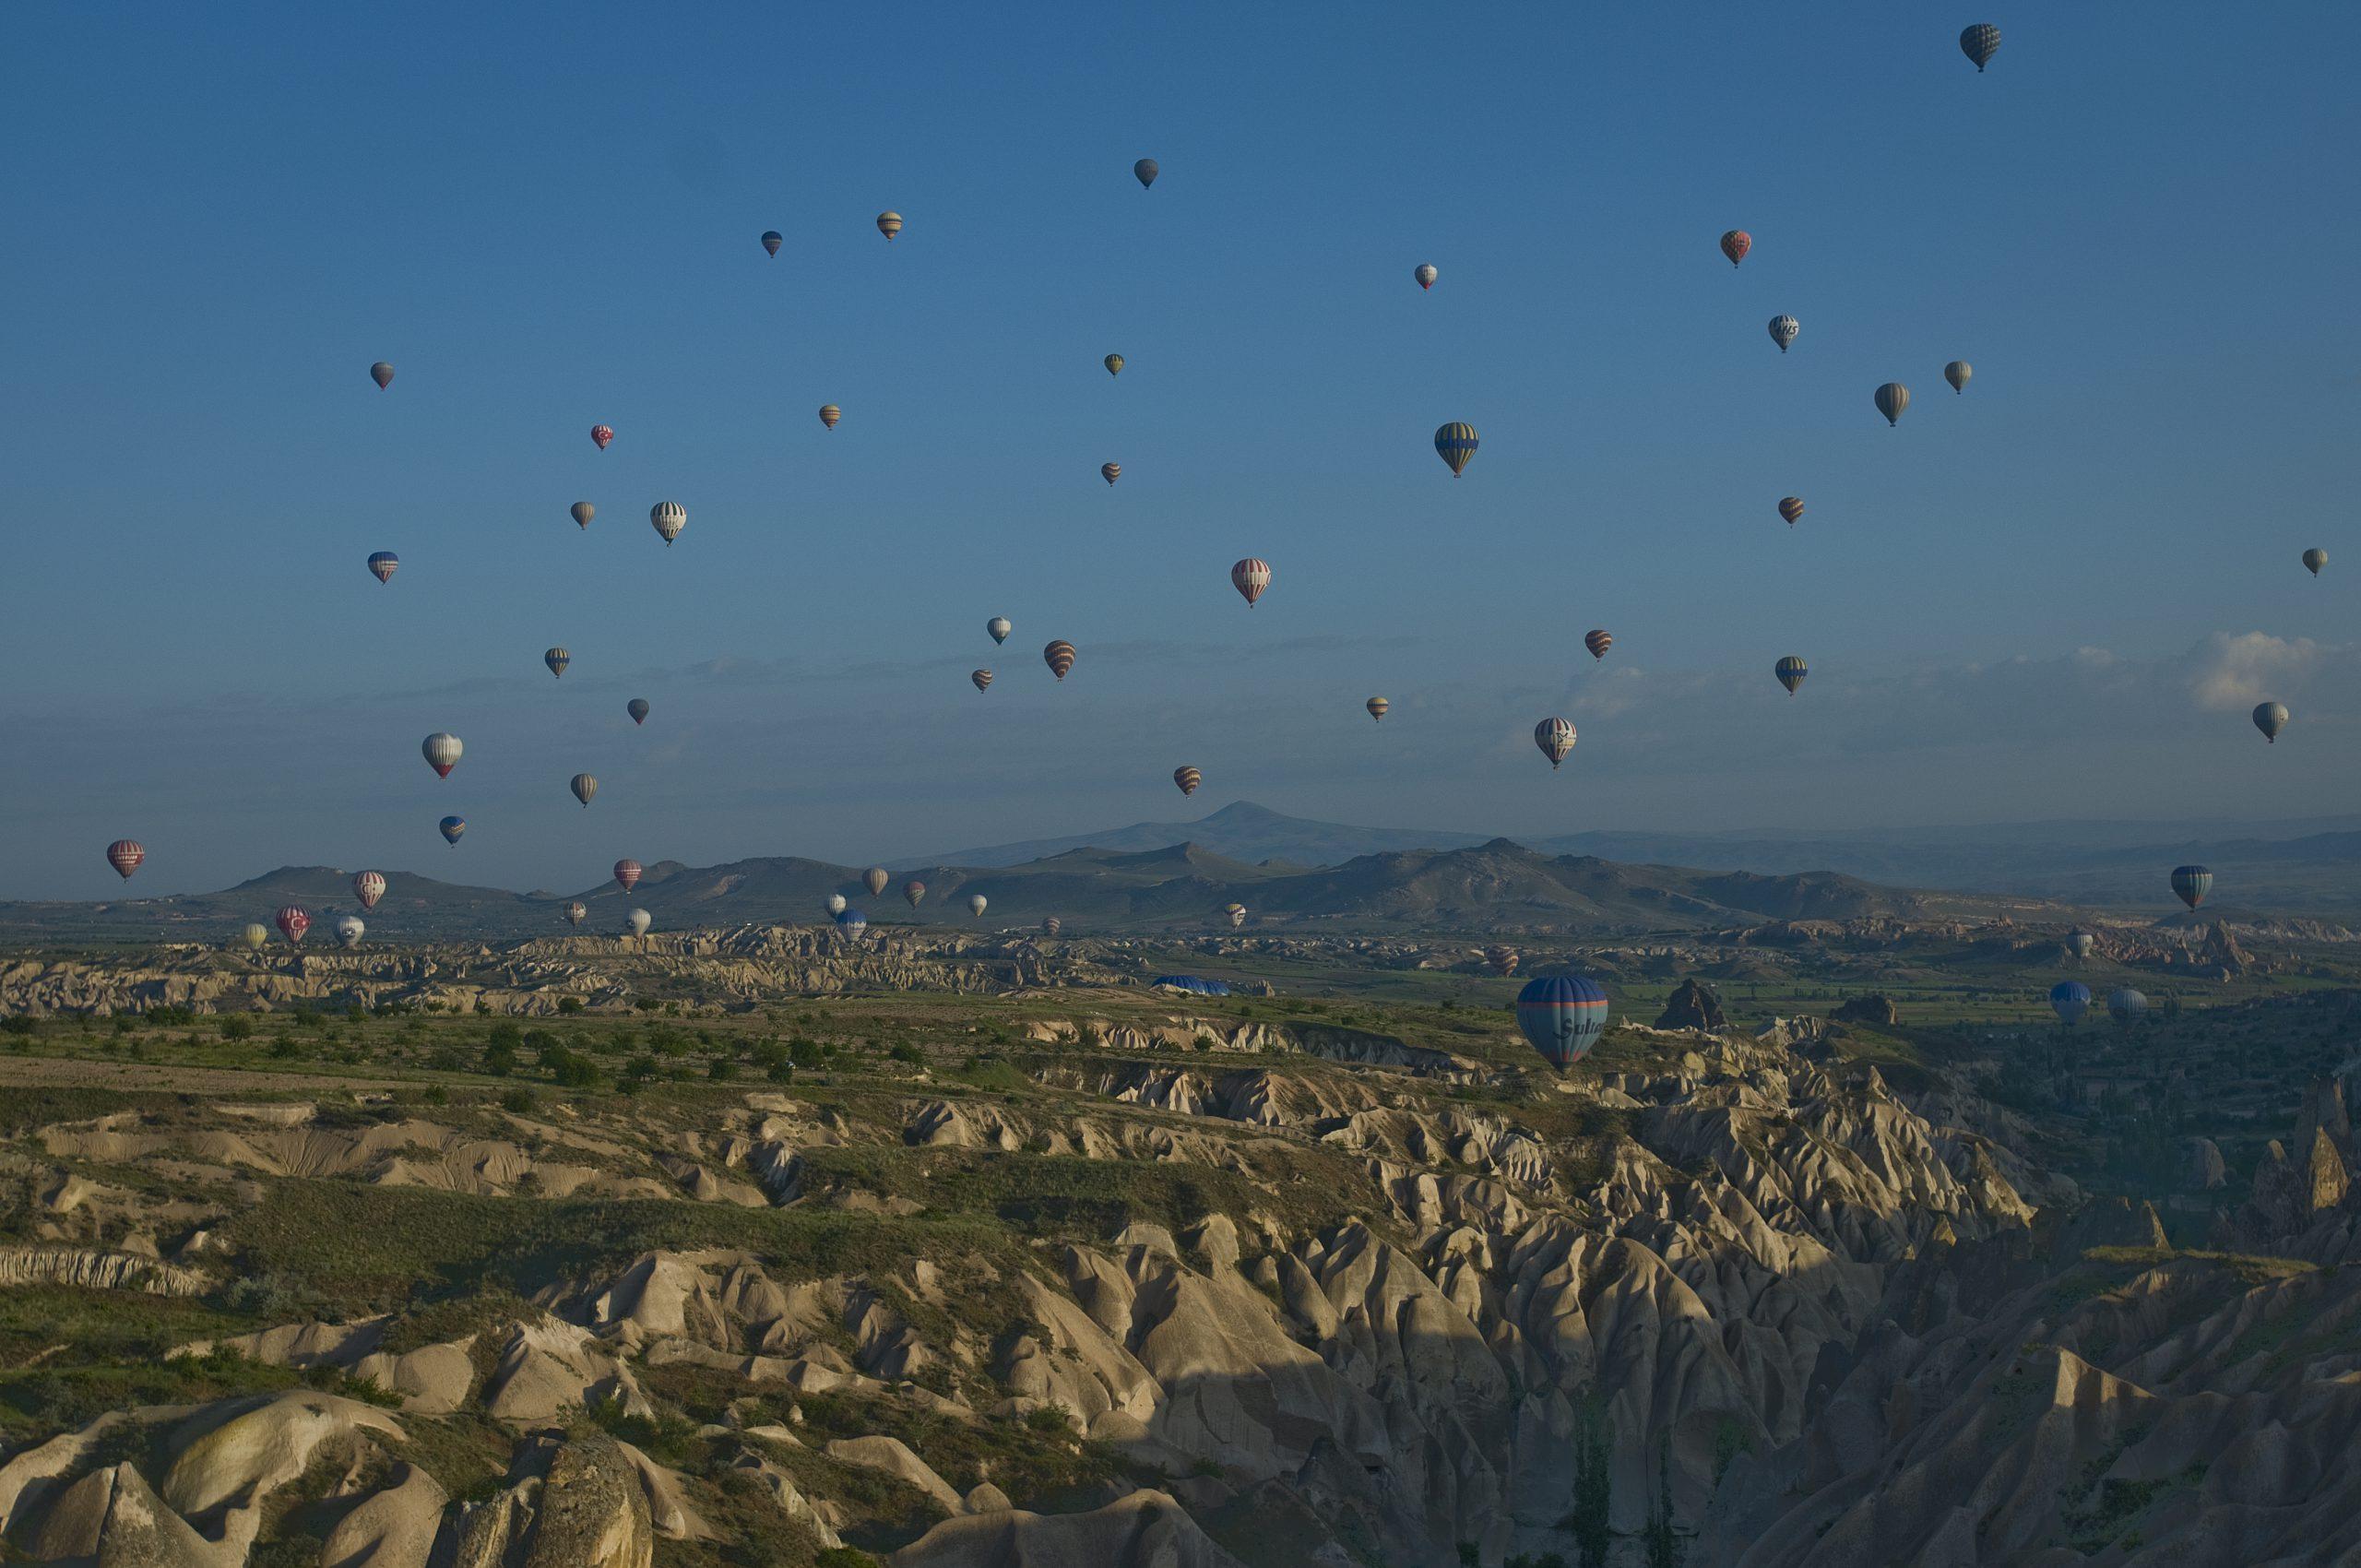 Cappadocia balloons - Turkey